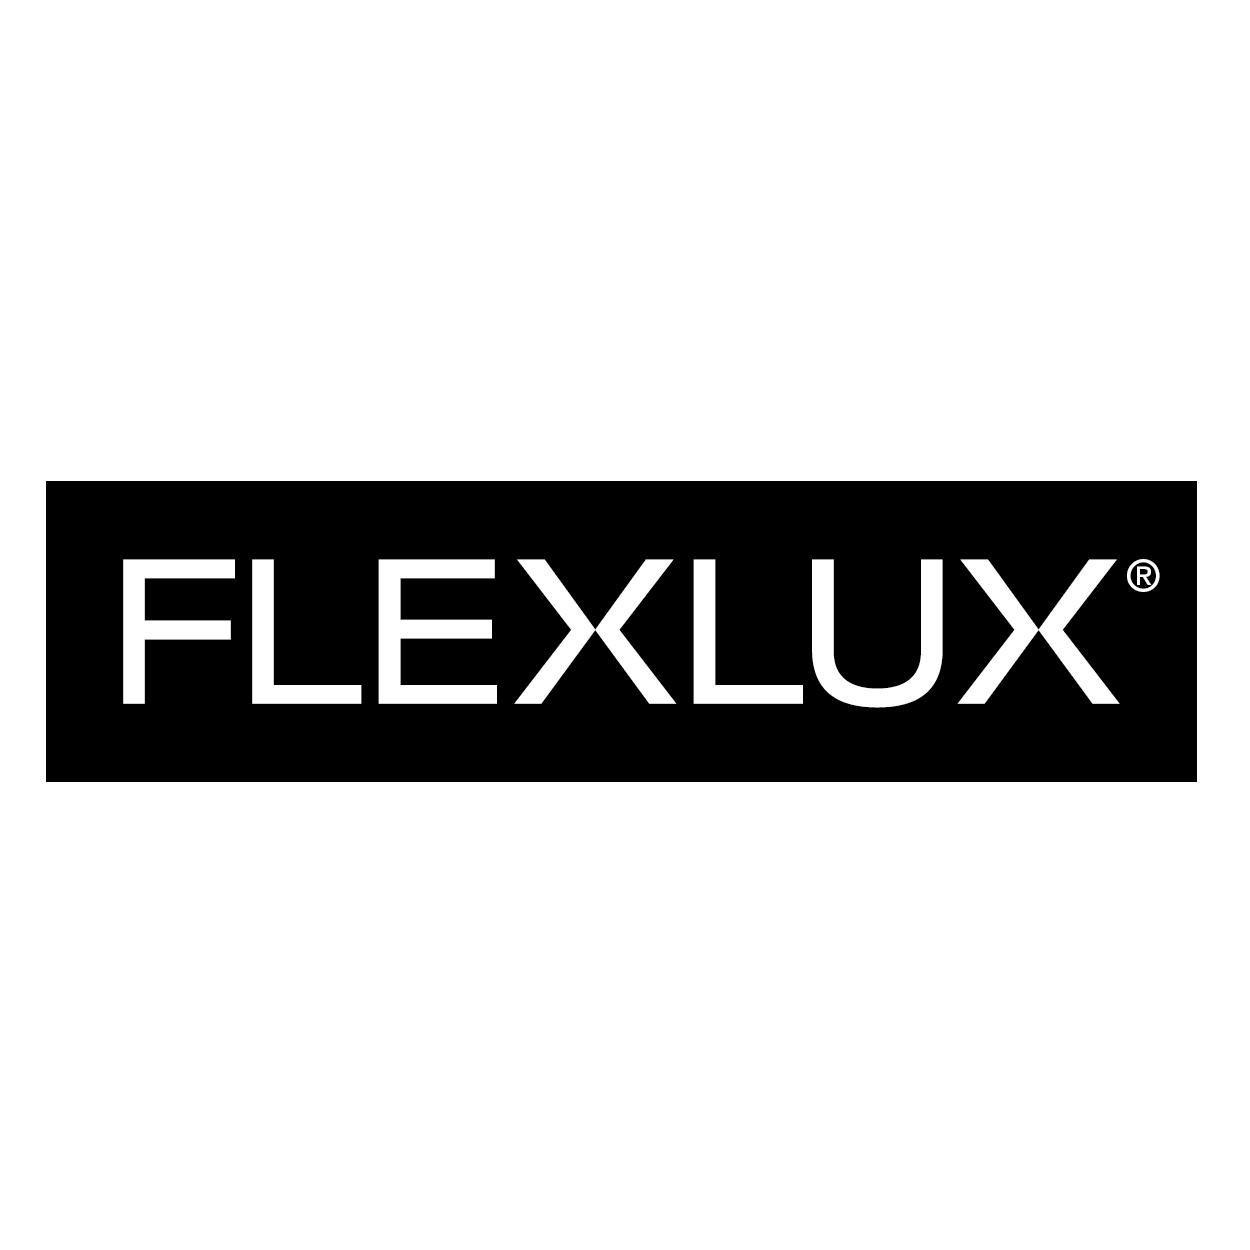 Flexlux